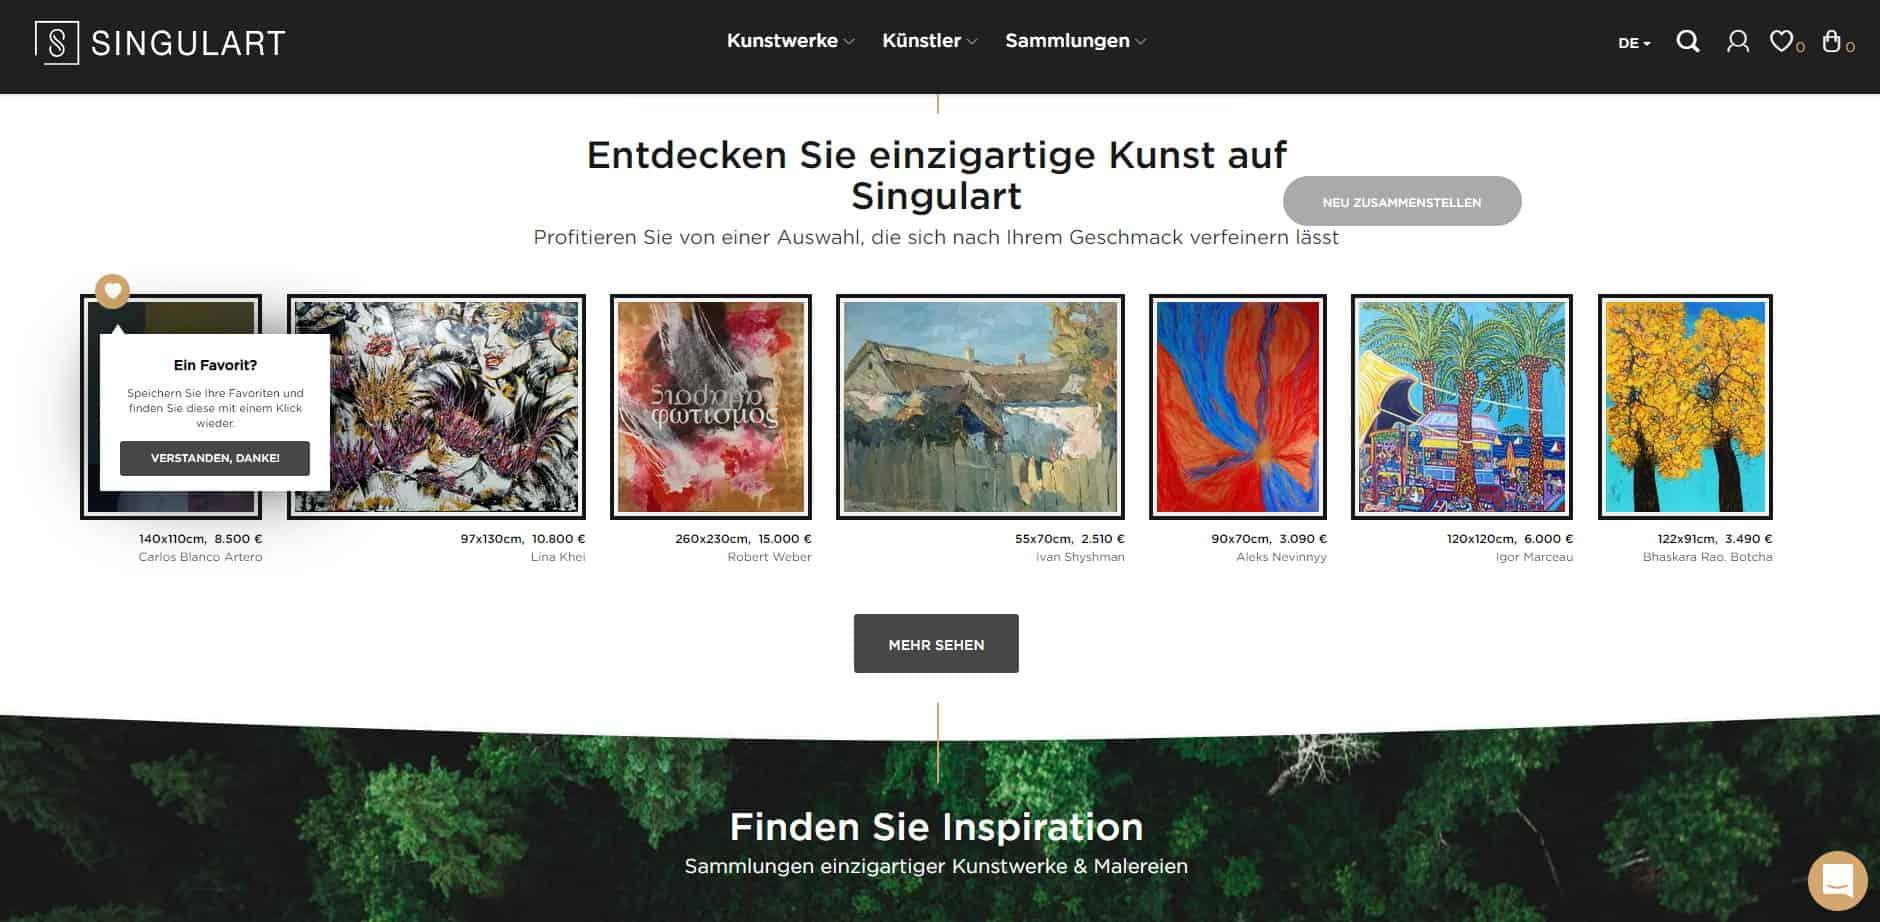 Singulart - Internationale Online Kunstgalerie